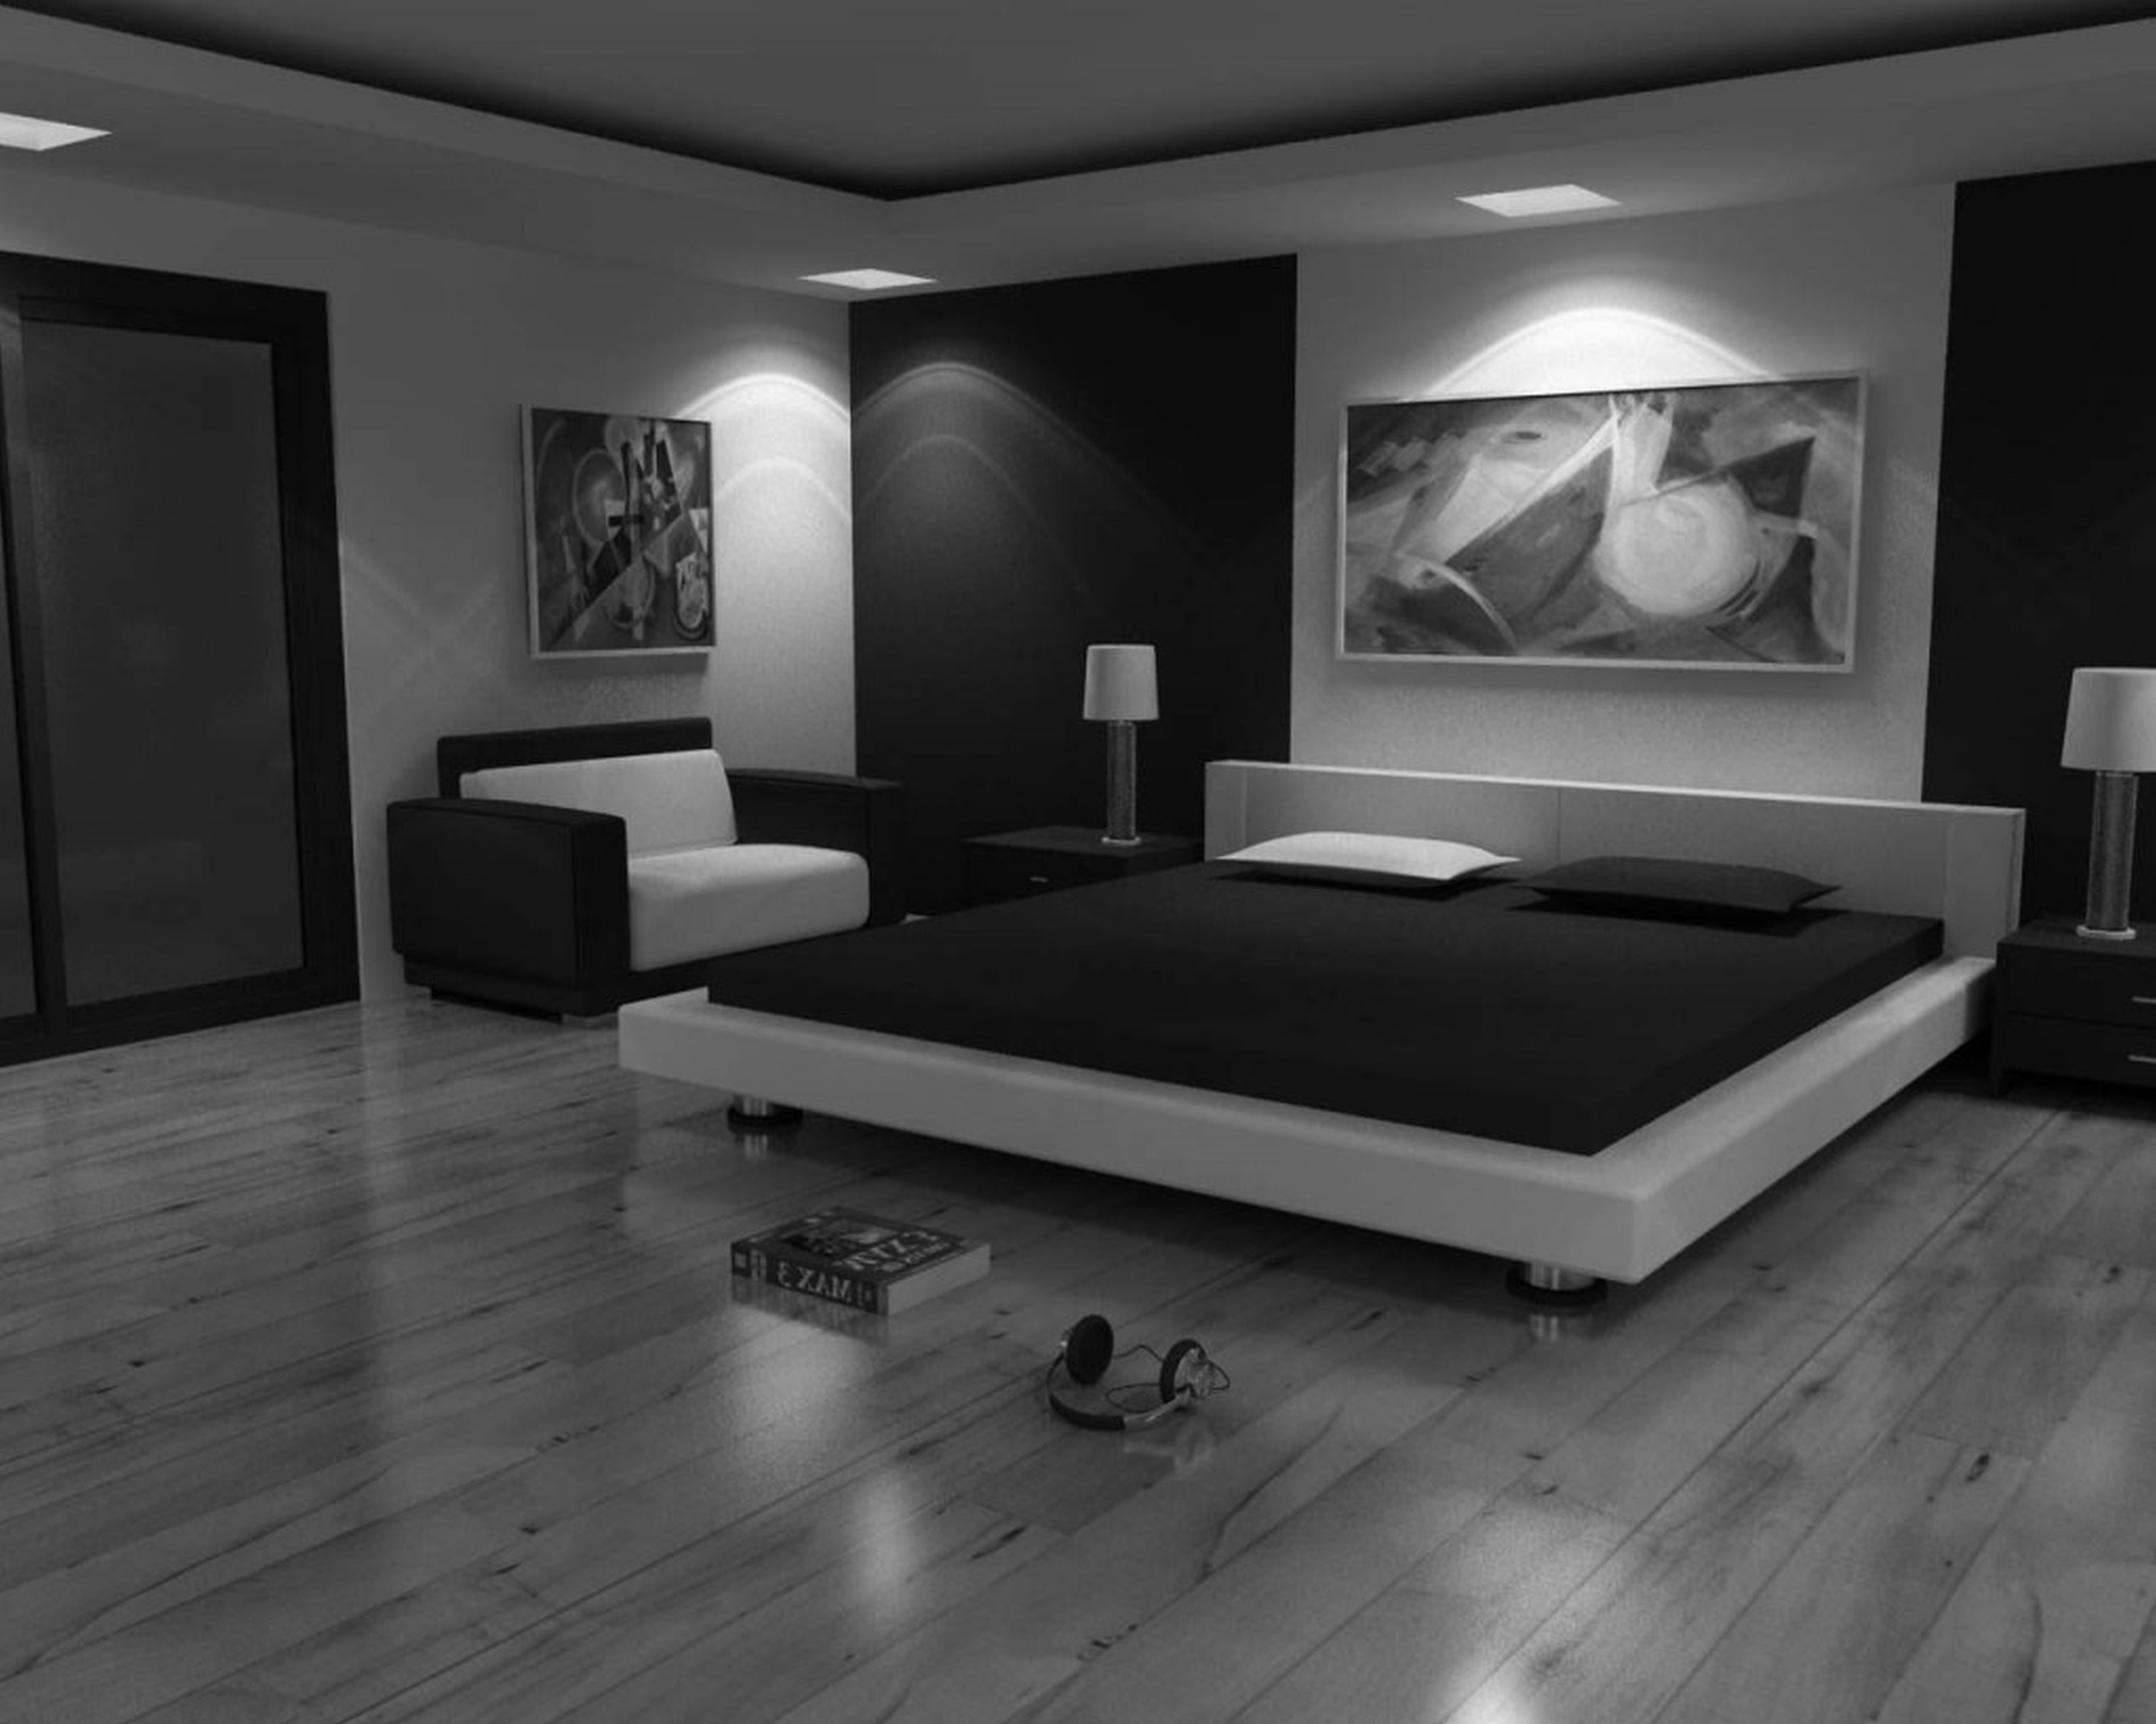 black and white bedroom designs for men photo - 2